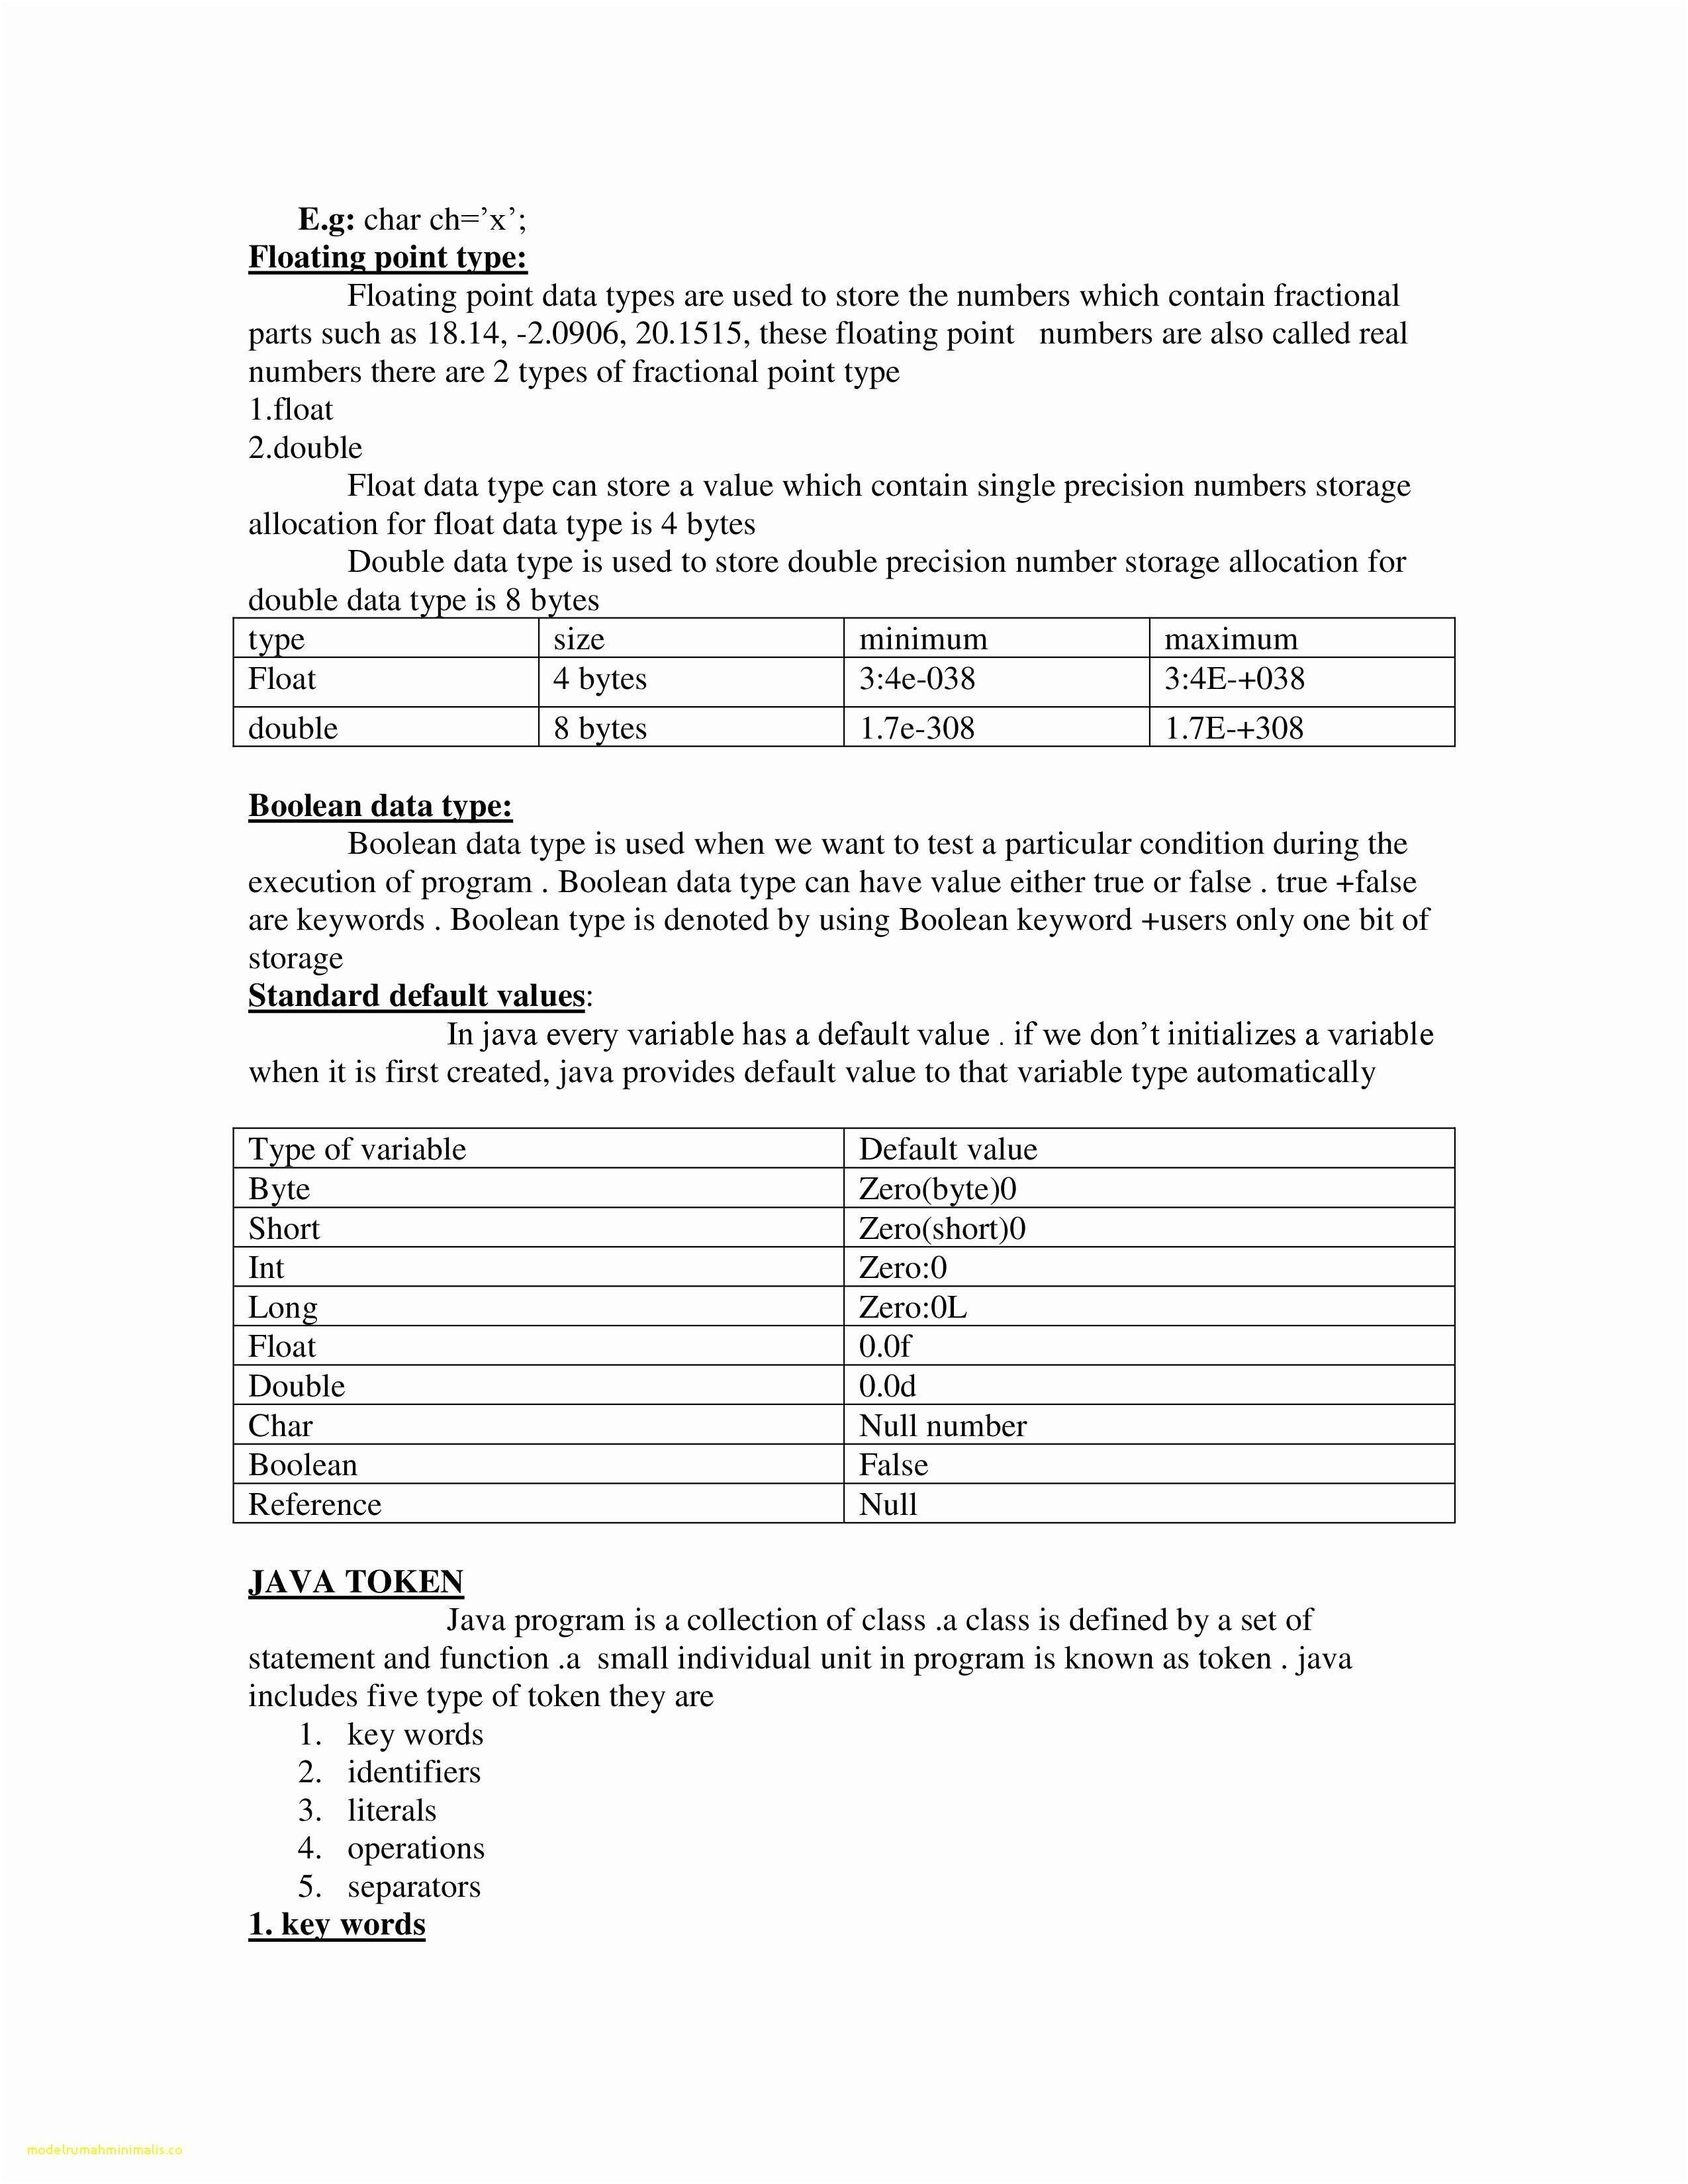 Printable Customizable Calendars Calendar Logo Blank Calender Template Calendar March 0d Calendars – Turtleconservationcentre